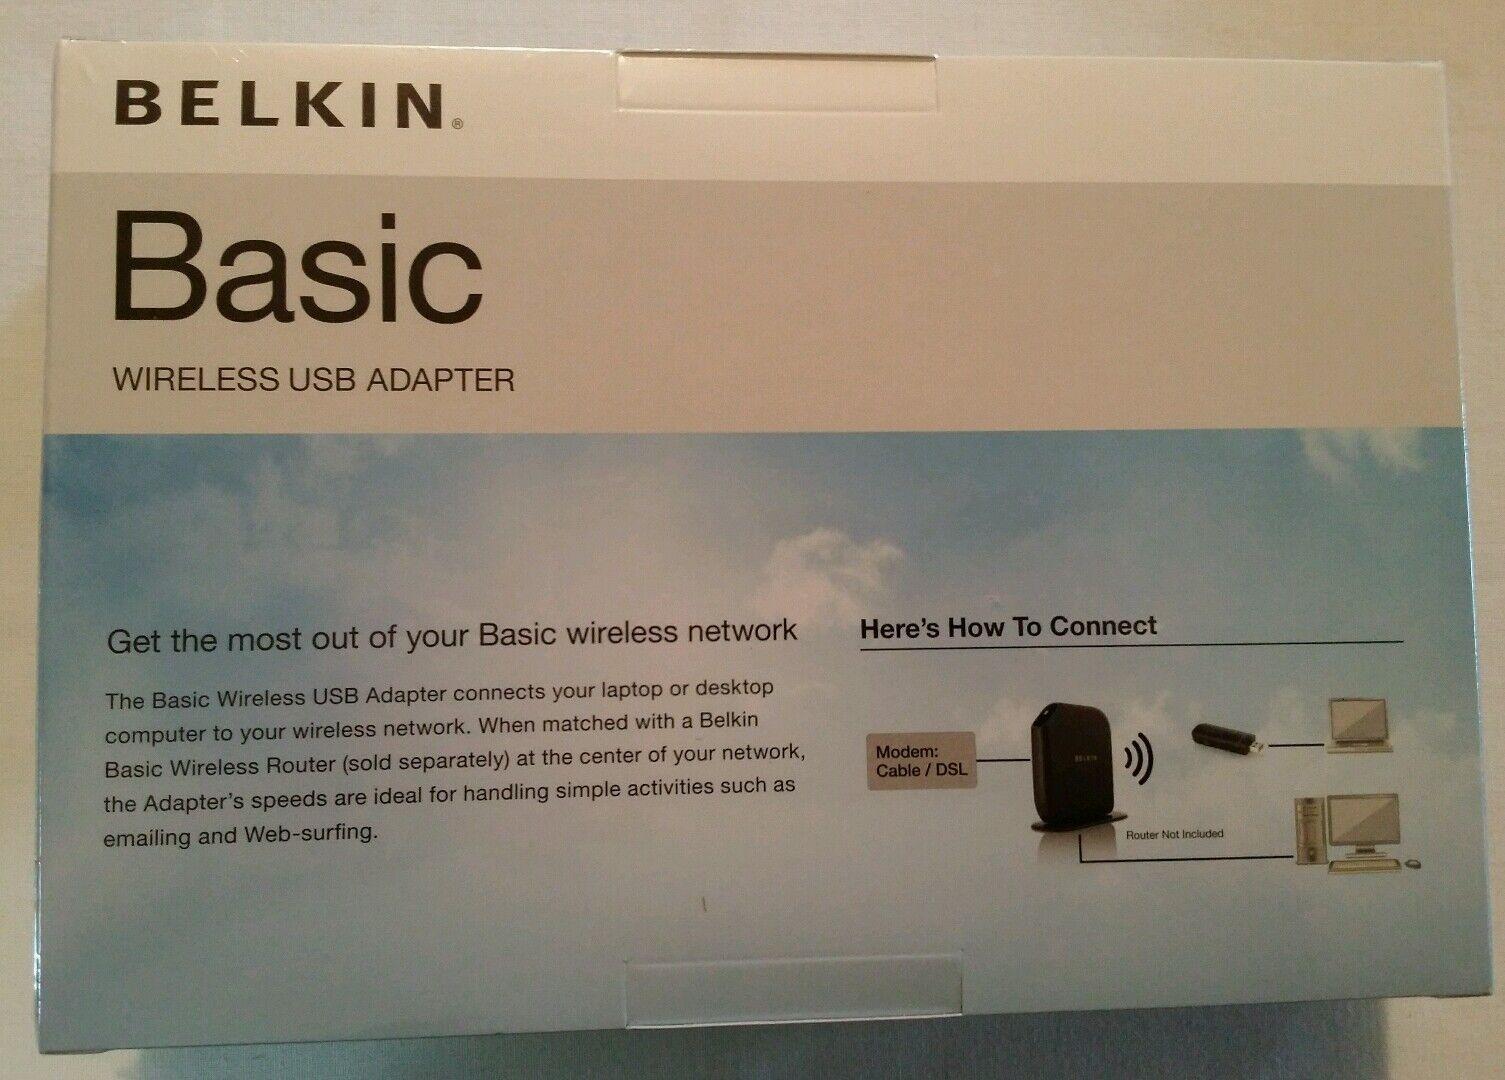 BELKIN BASIC WIRELESS USB ADAPTER WINDOWS 7 DRIVER